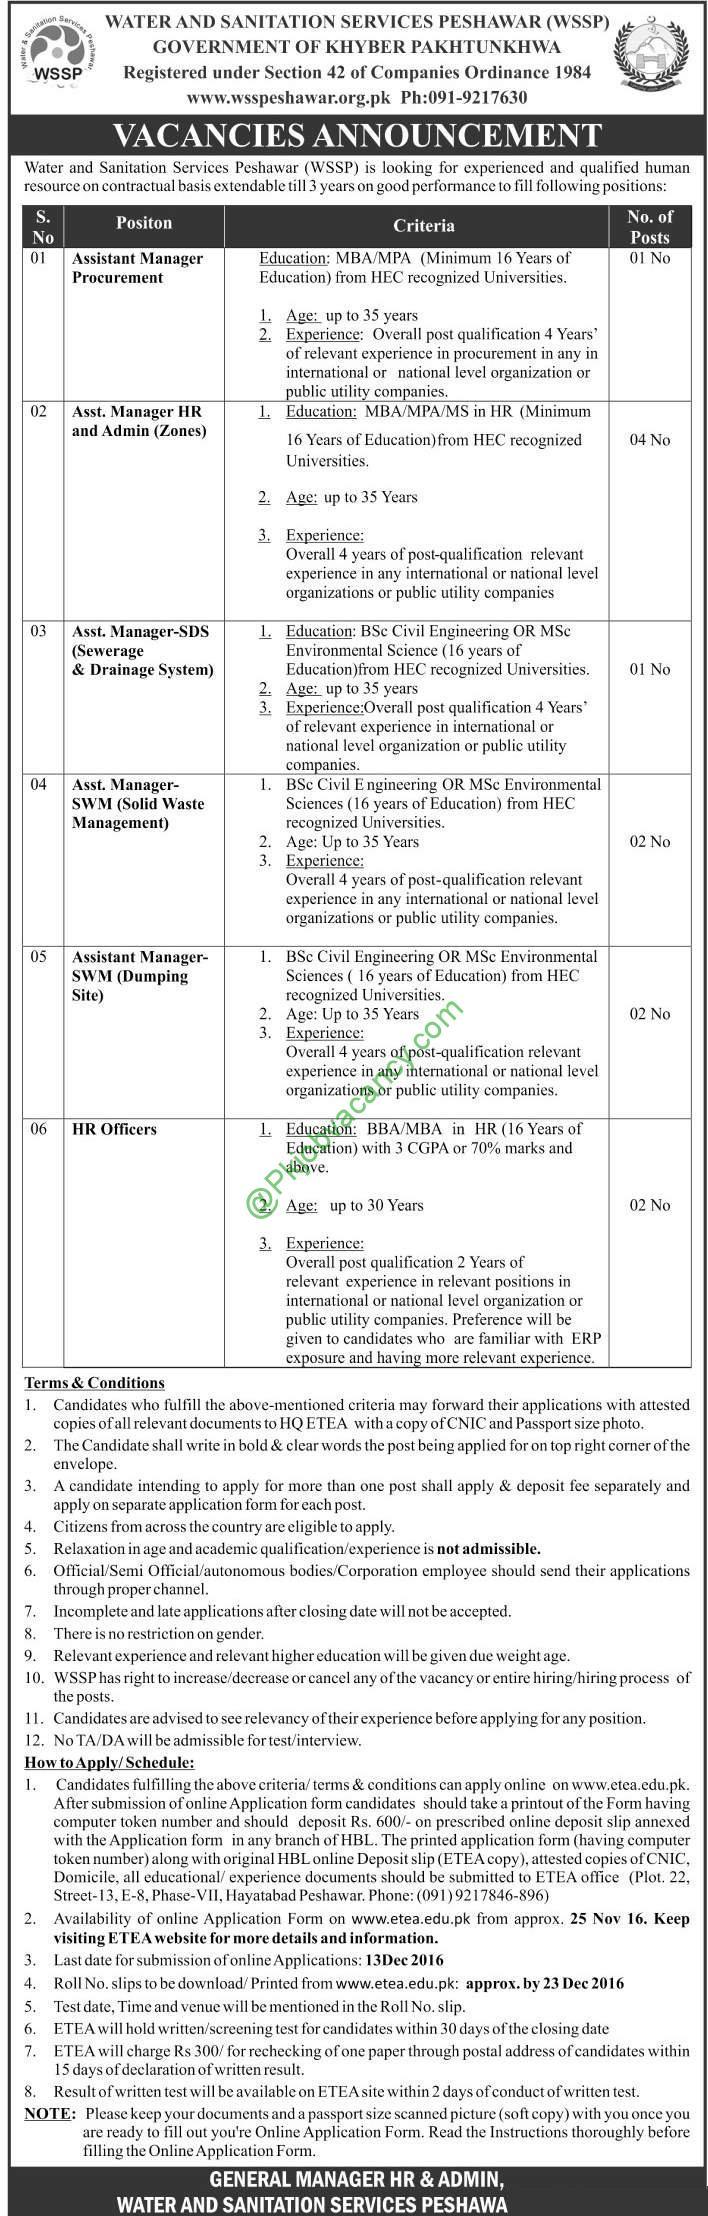 Water And Sanitation Services Peshawar WSSP Jobs November 2016 Apply ...